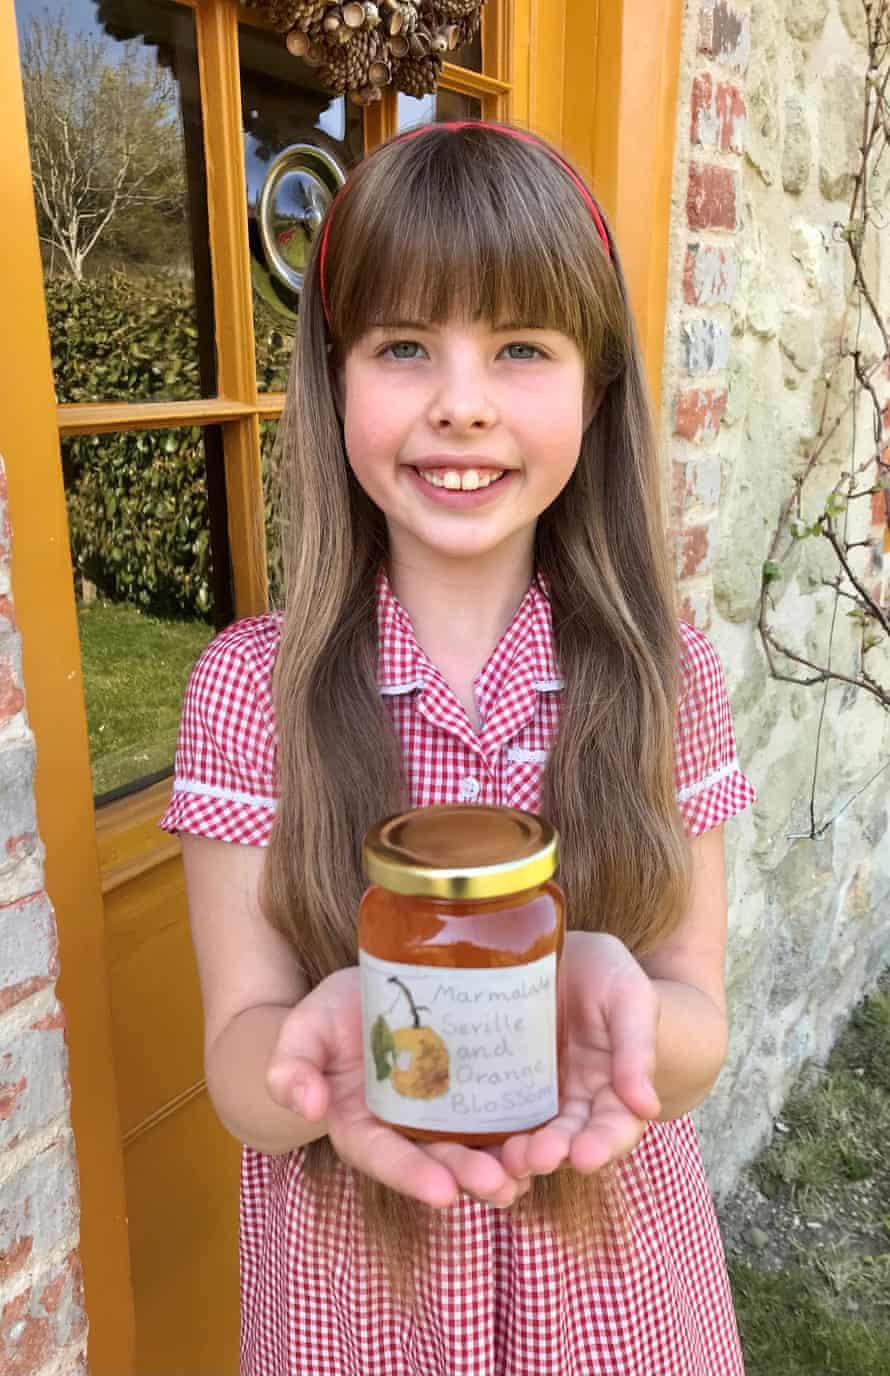 Flora Rider with jar of marmalade